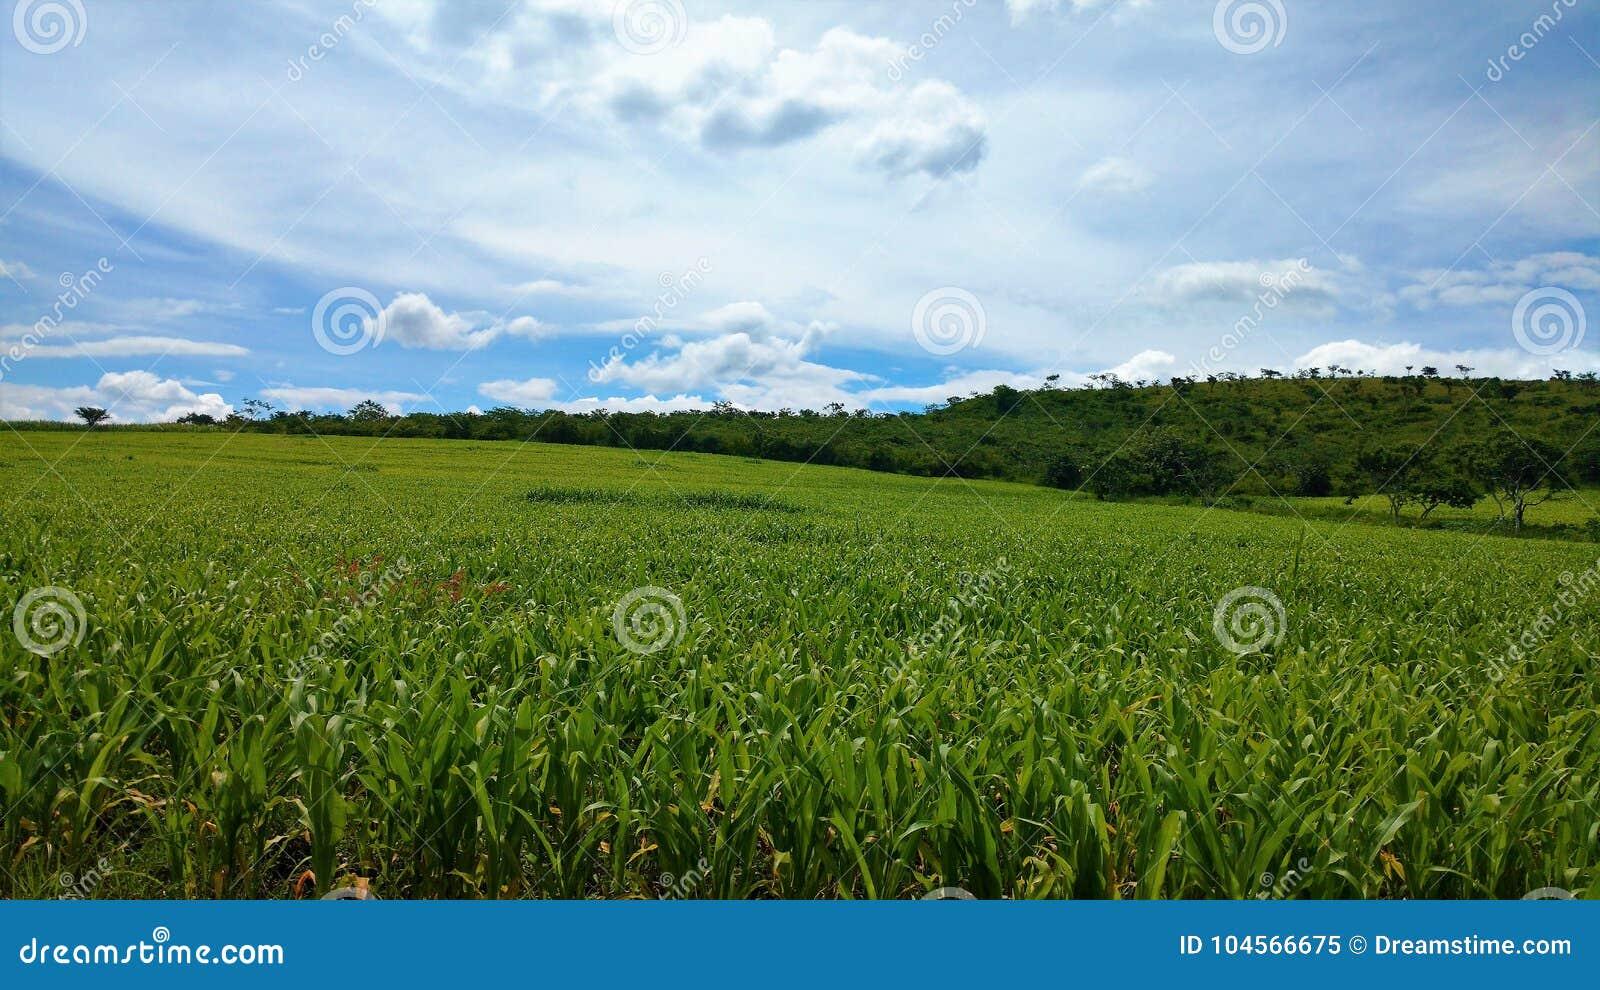 Corn crop under blue sky